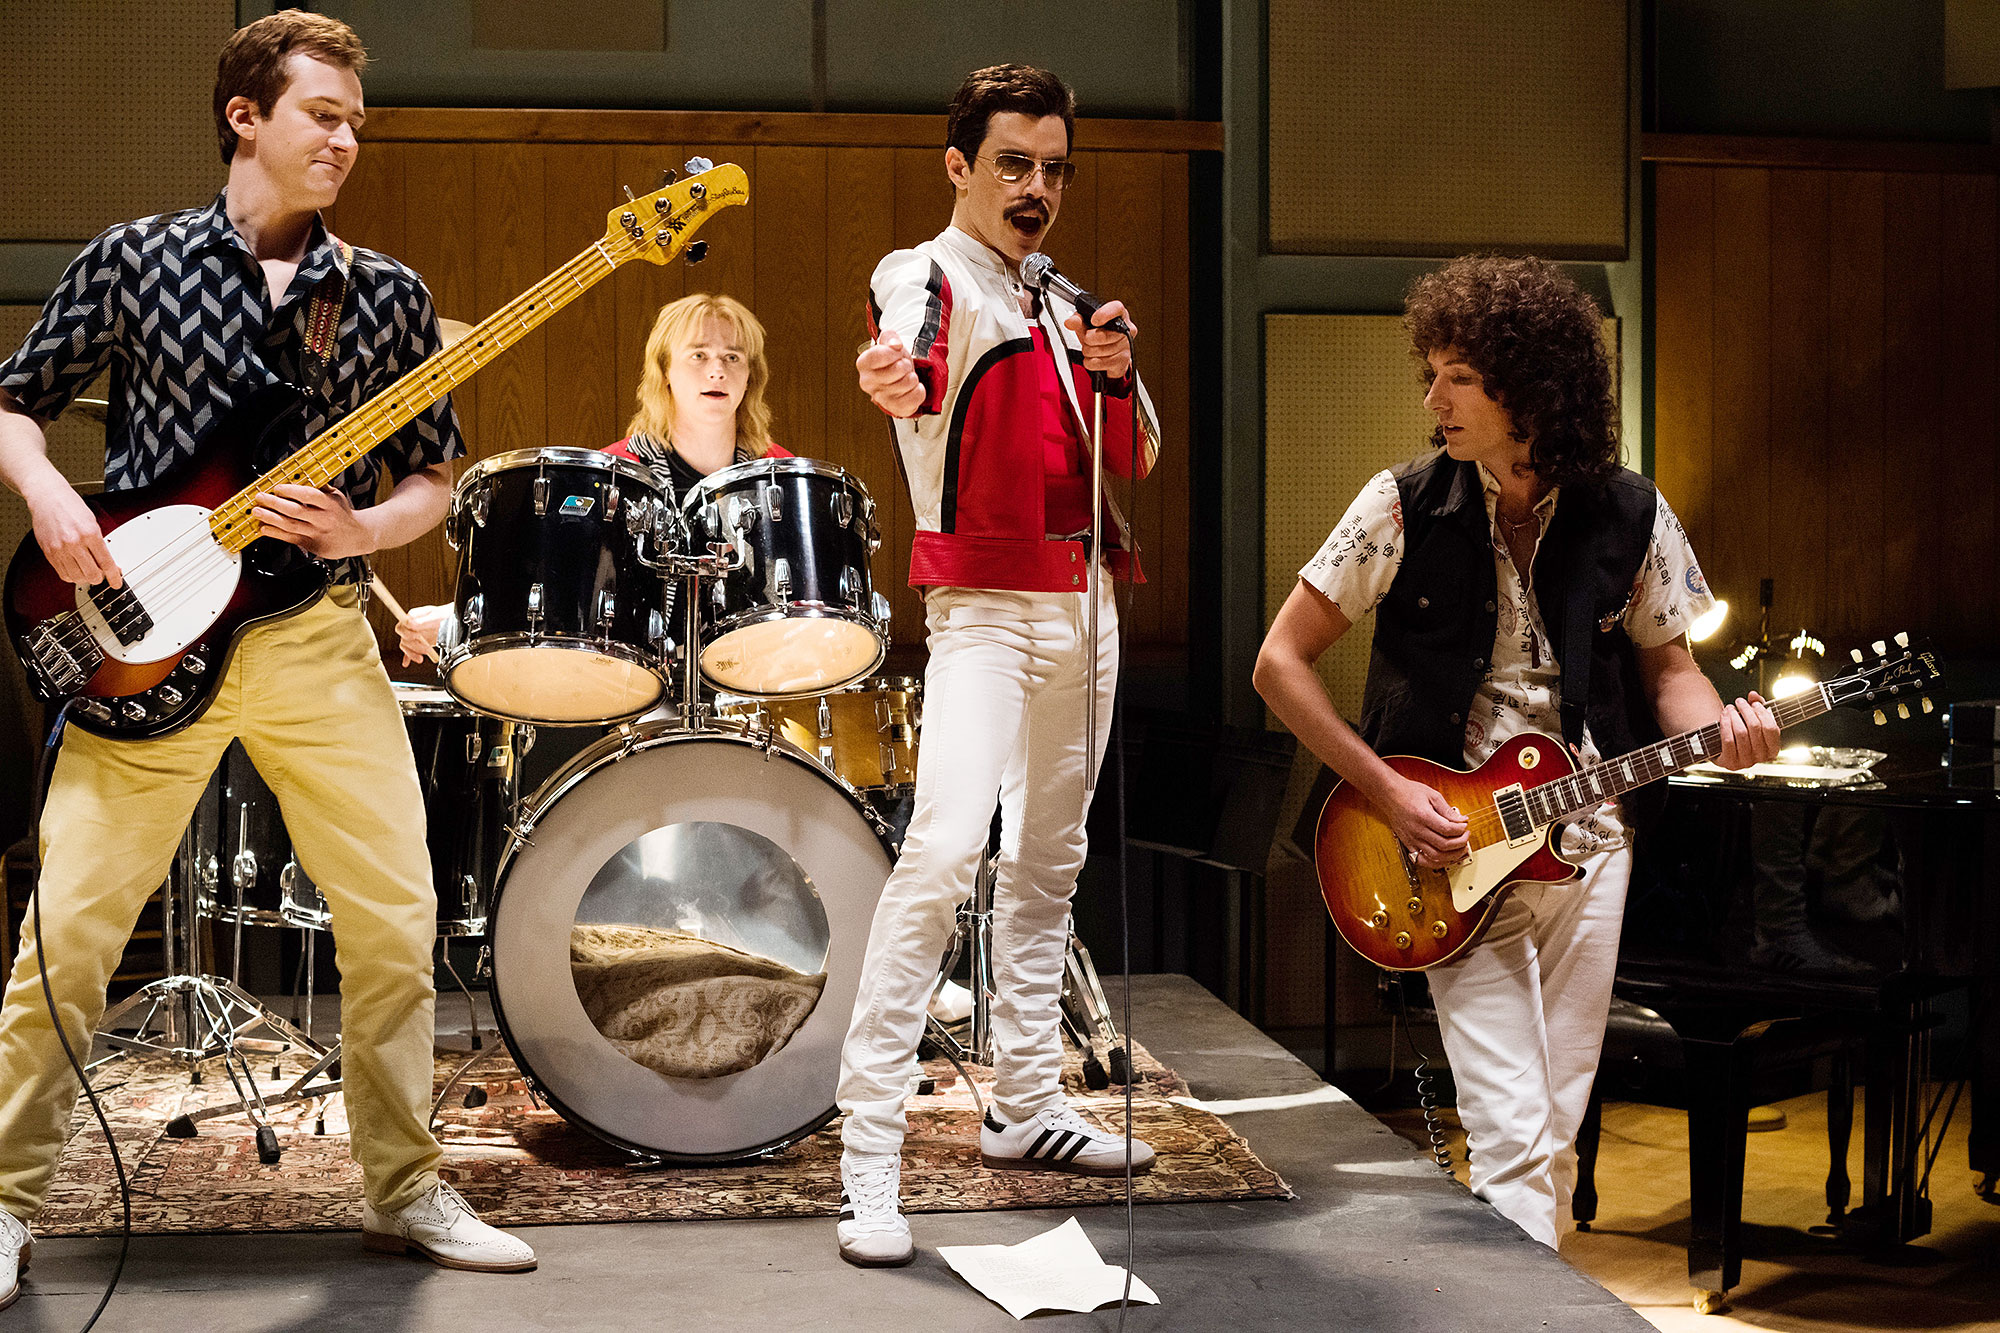 Oscars 2019 Bohemian Rhapsody Sound Mixing - Black Panther Bohemian Rhapsody First Man Roma A Star Is Born